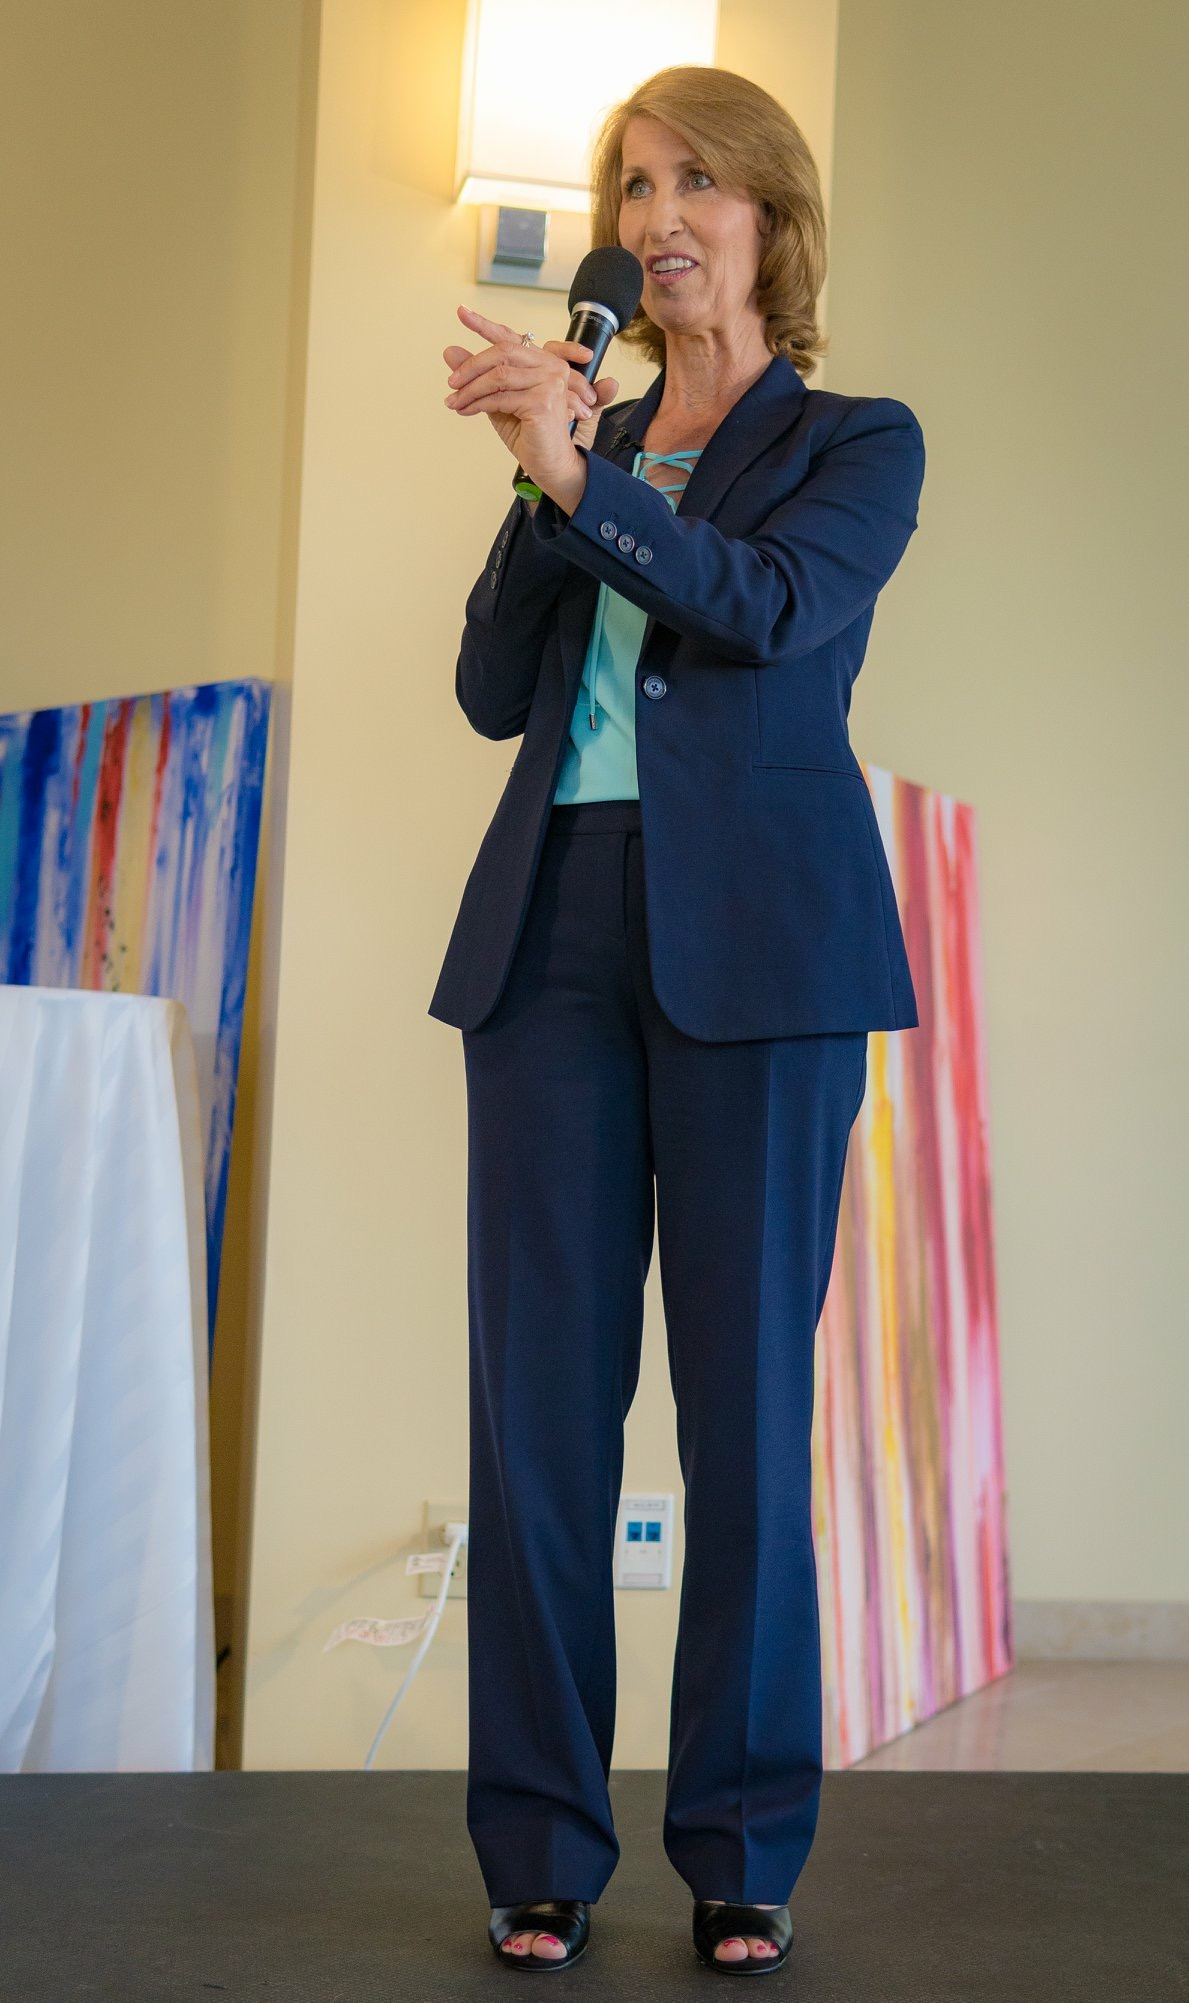 Speaking at RealEstateNetwork.JPG